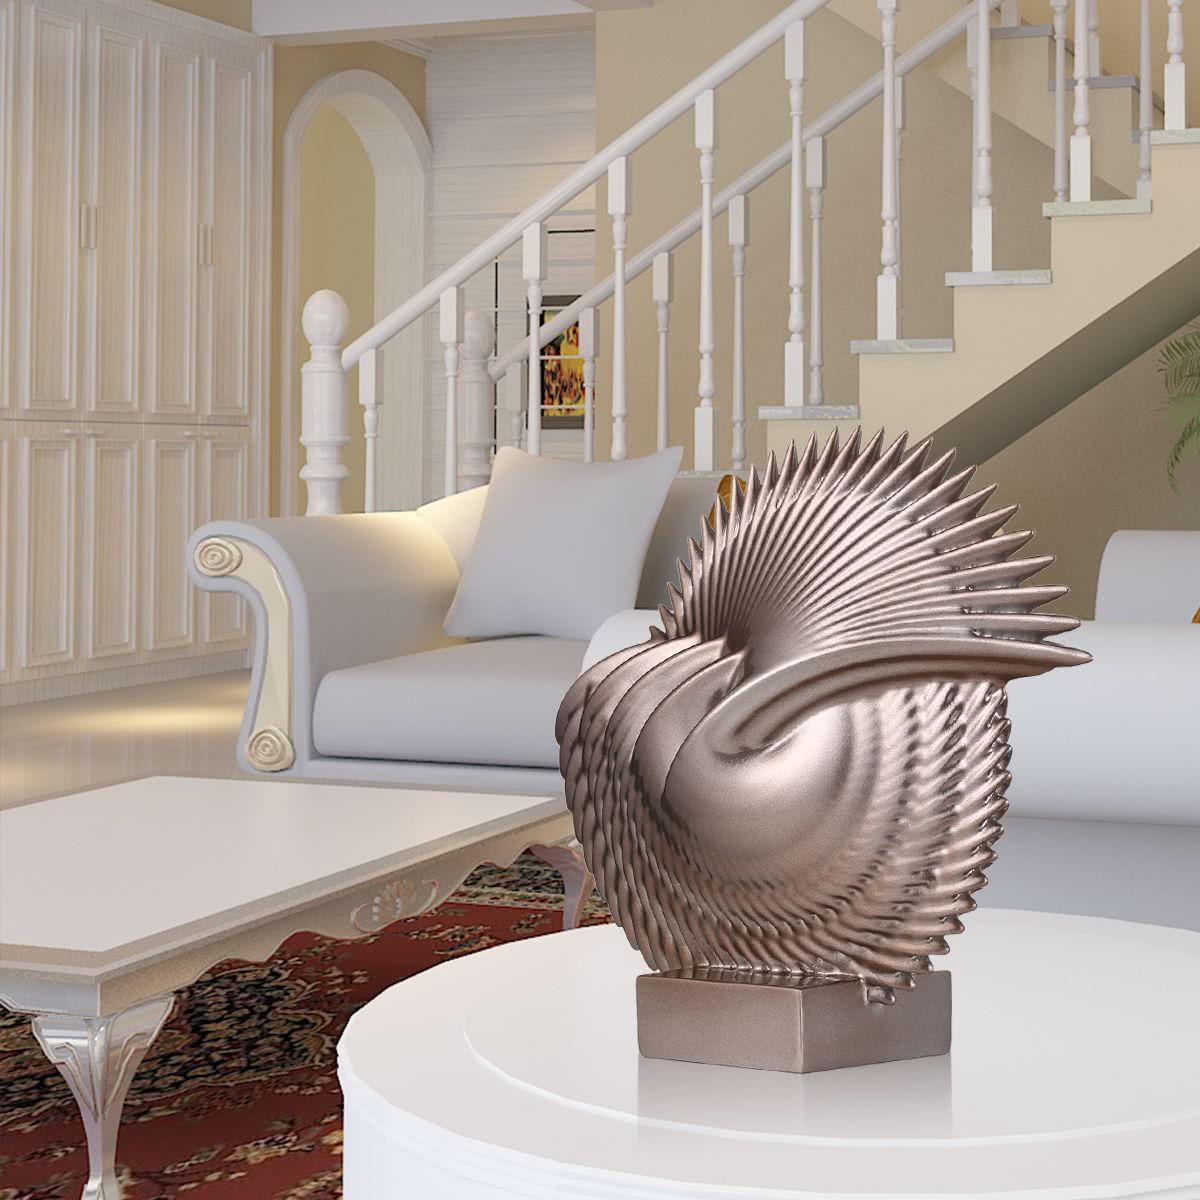 Hojas escultura de fibra de vidrio tomfeel la decoraci n for Decoracion hogar original